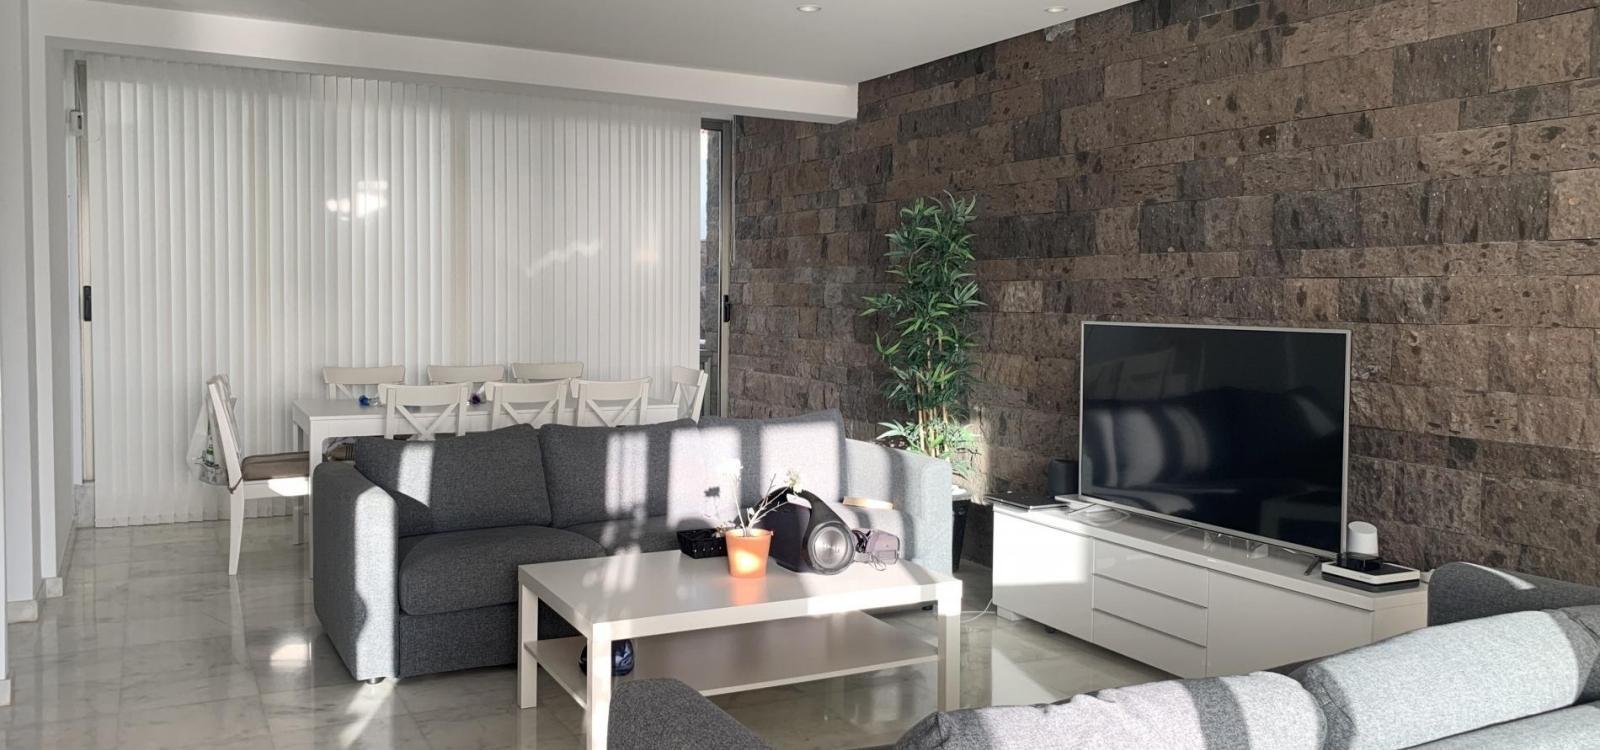 (O36) Nice and spacious private villa